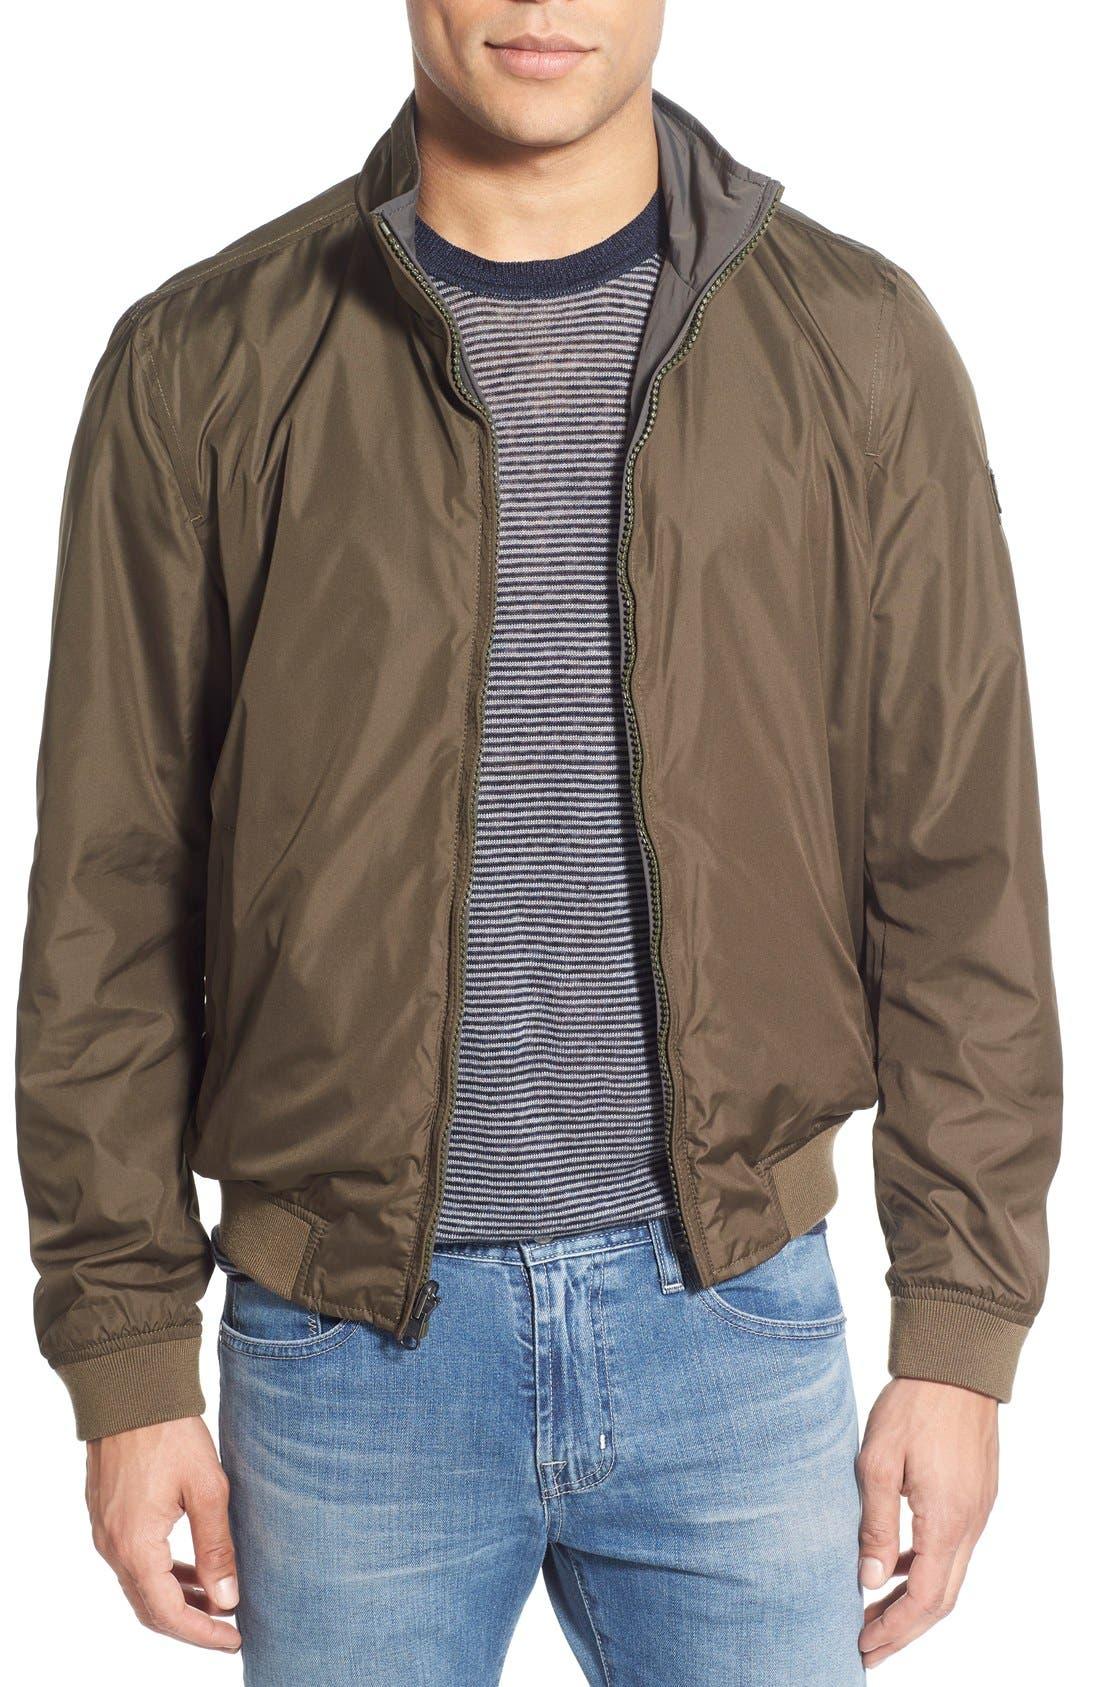 John Rich Reversible Jacket,                             Main thumbnail 1, color,                             308